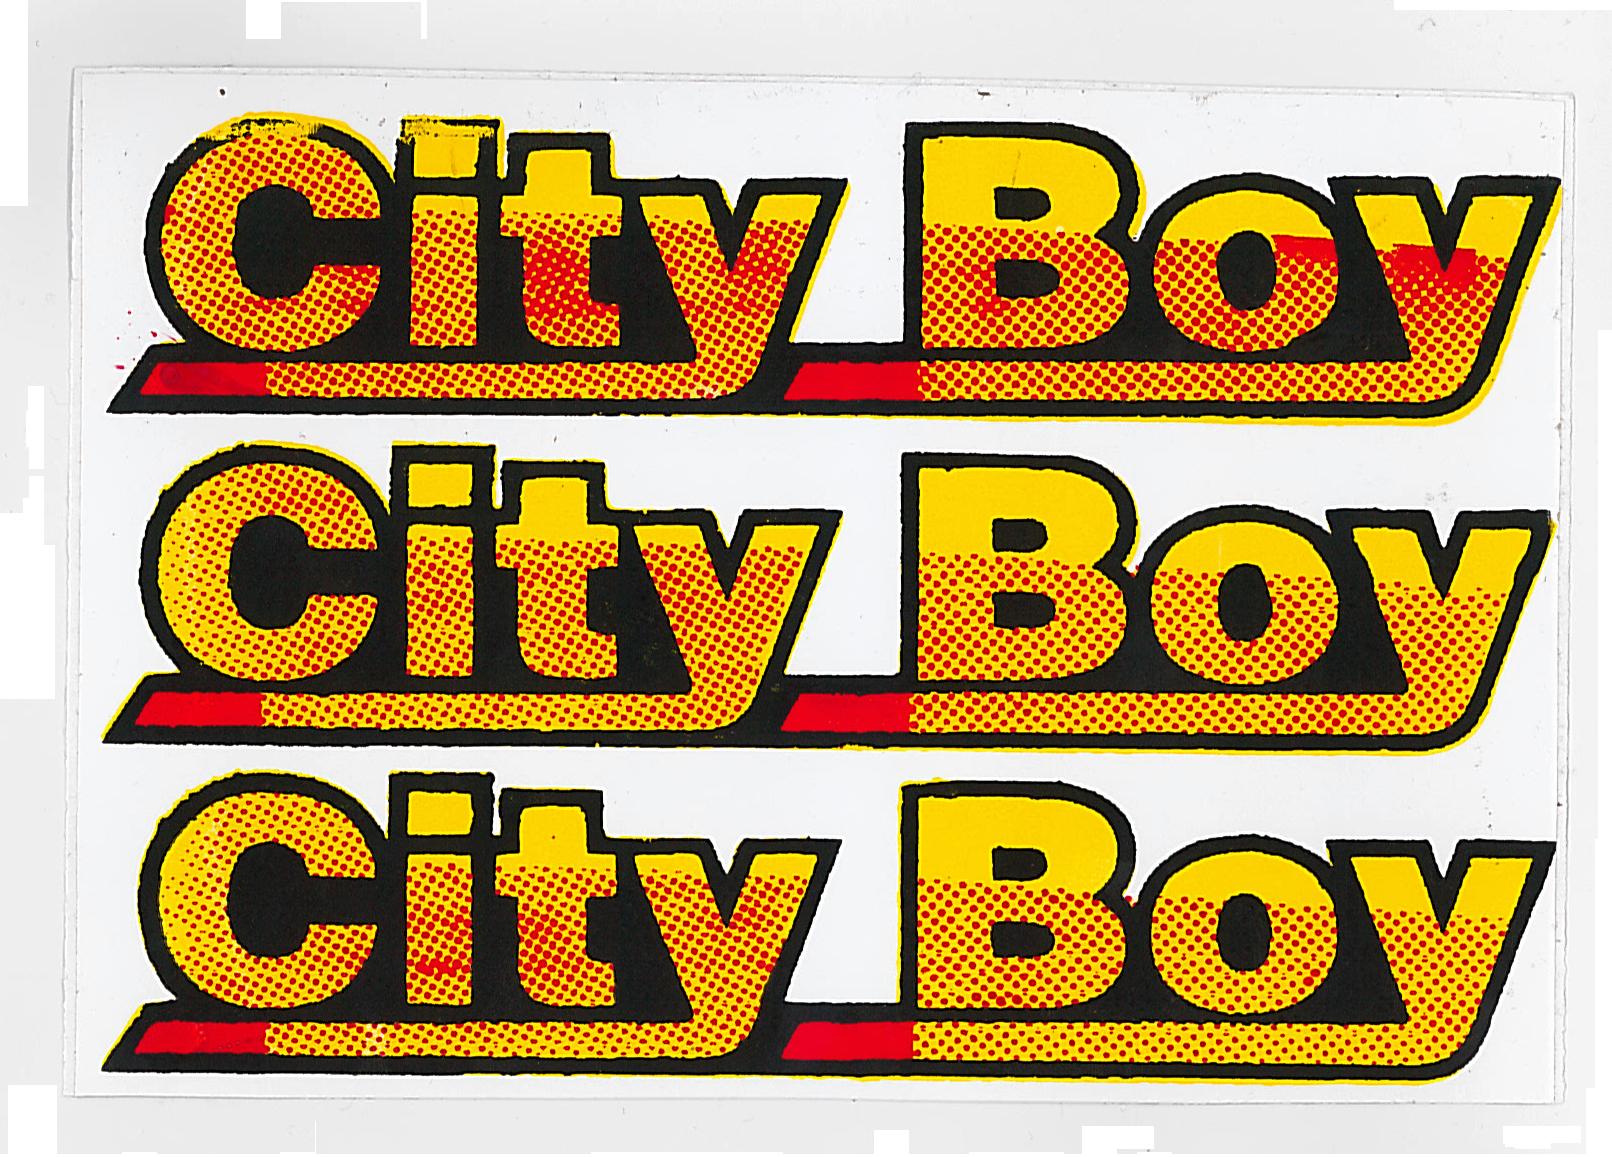 city-boy.png